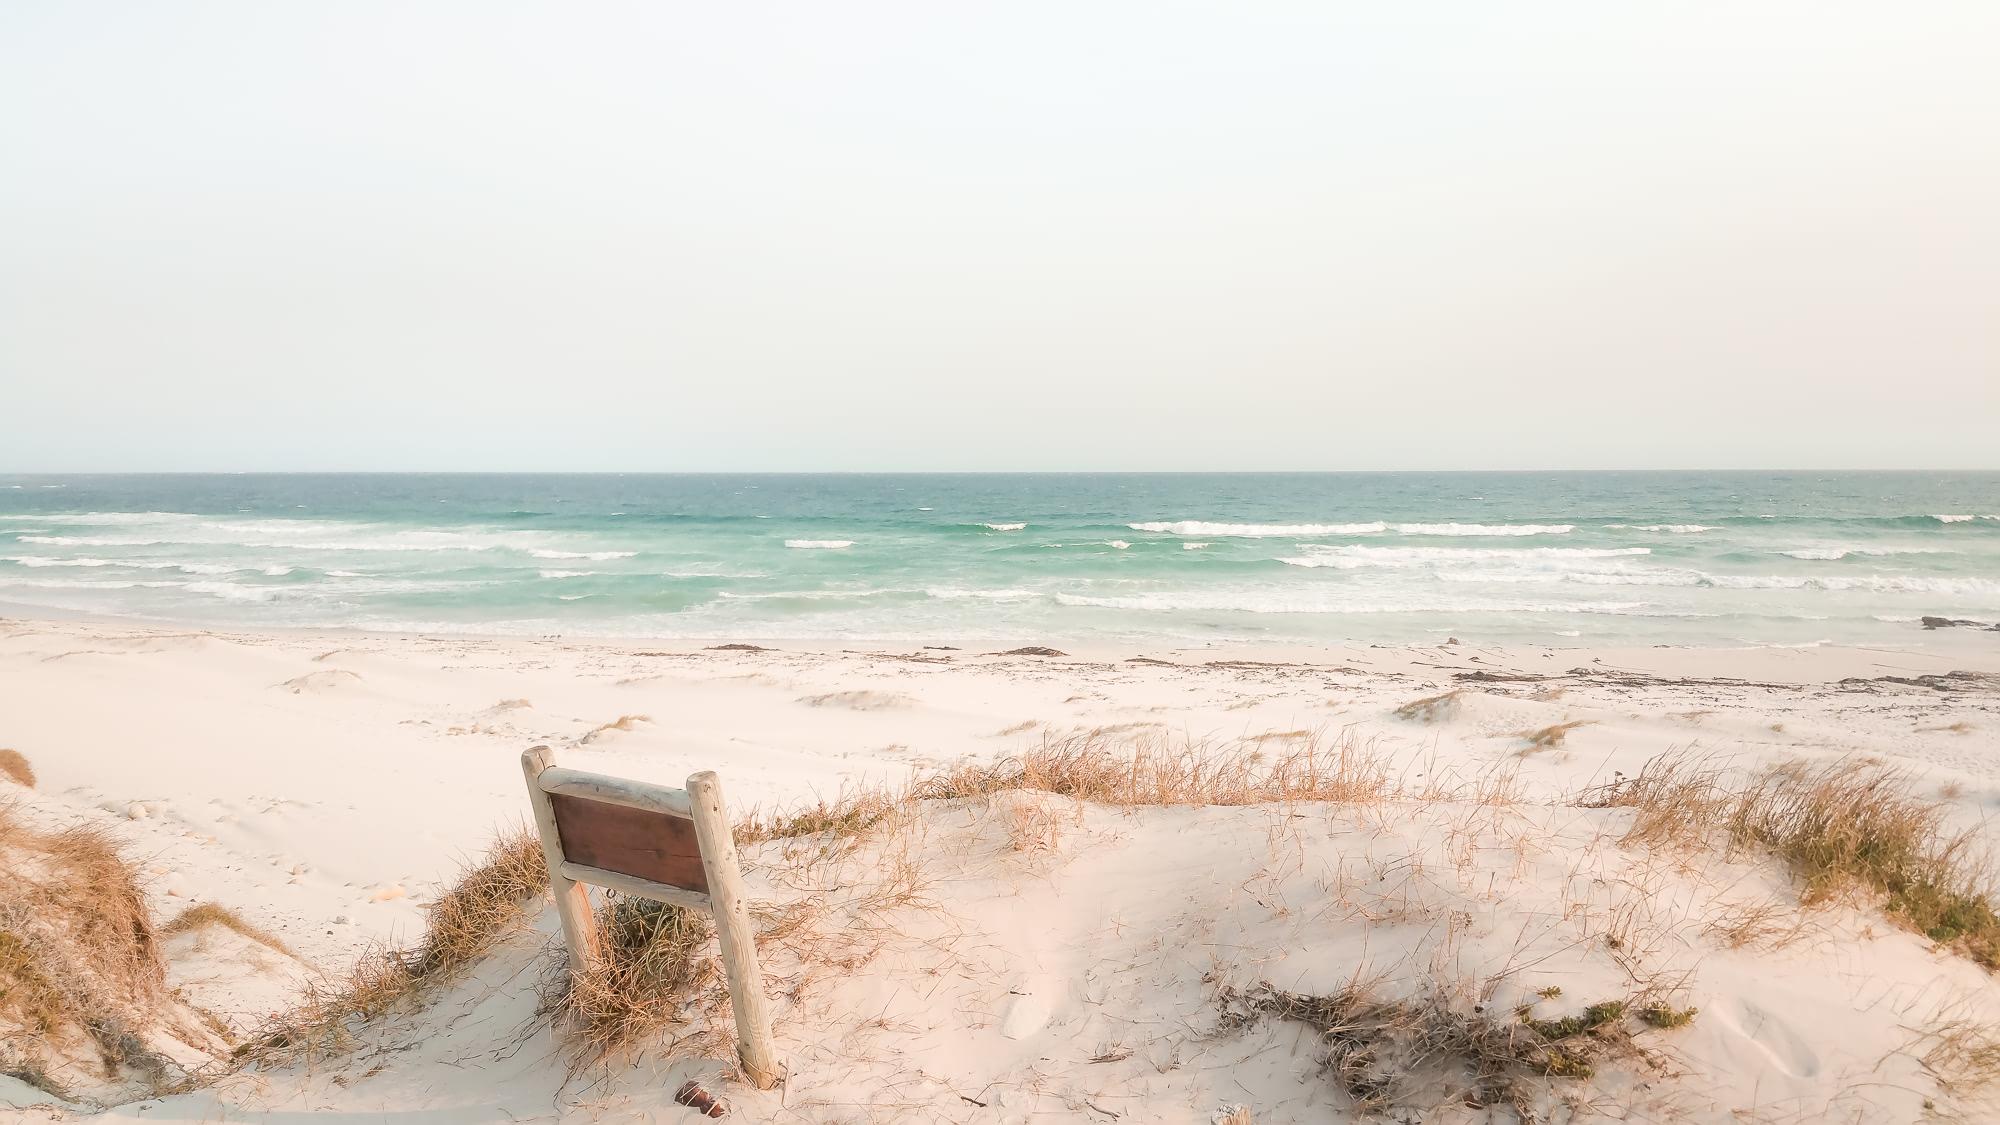 Platboom Beach South Africa